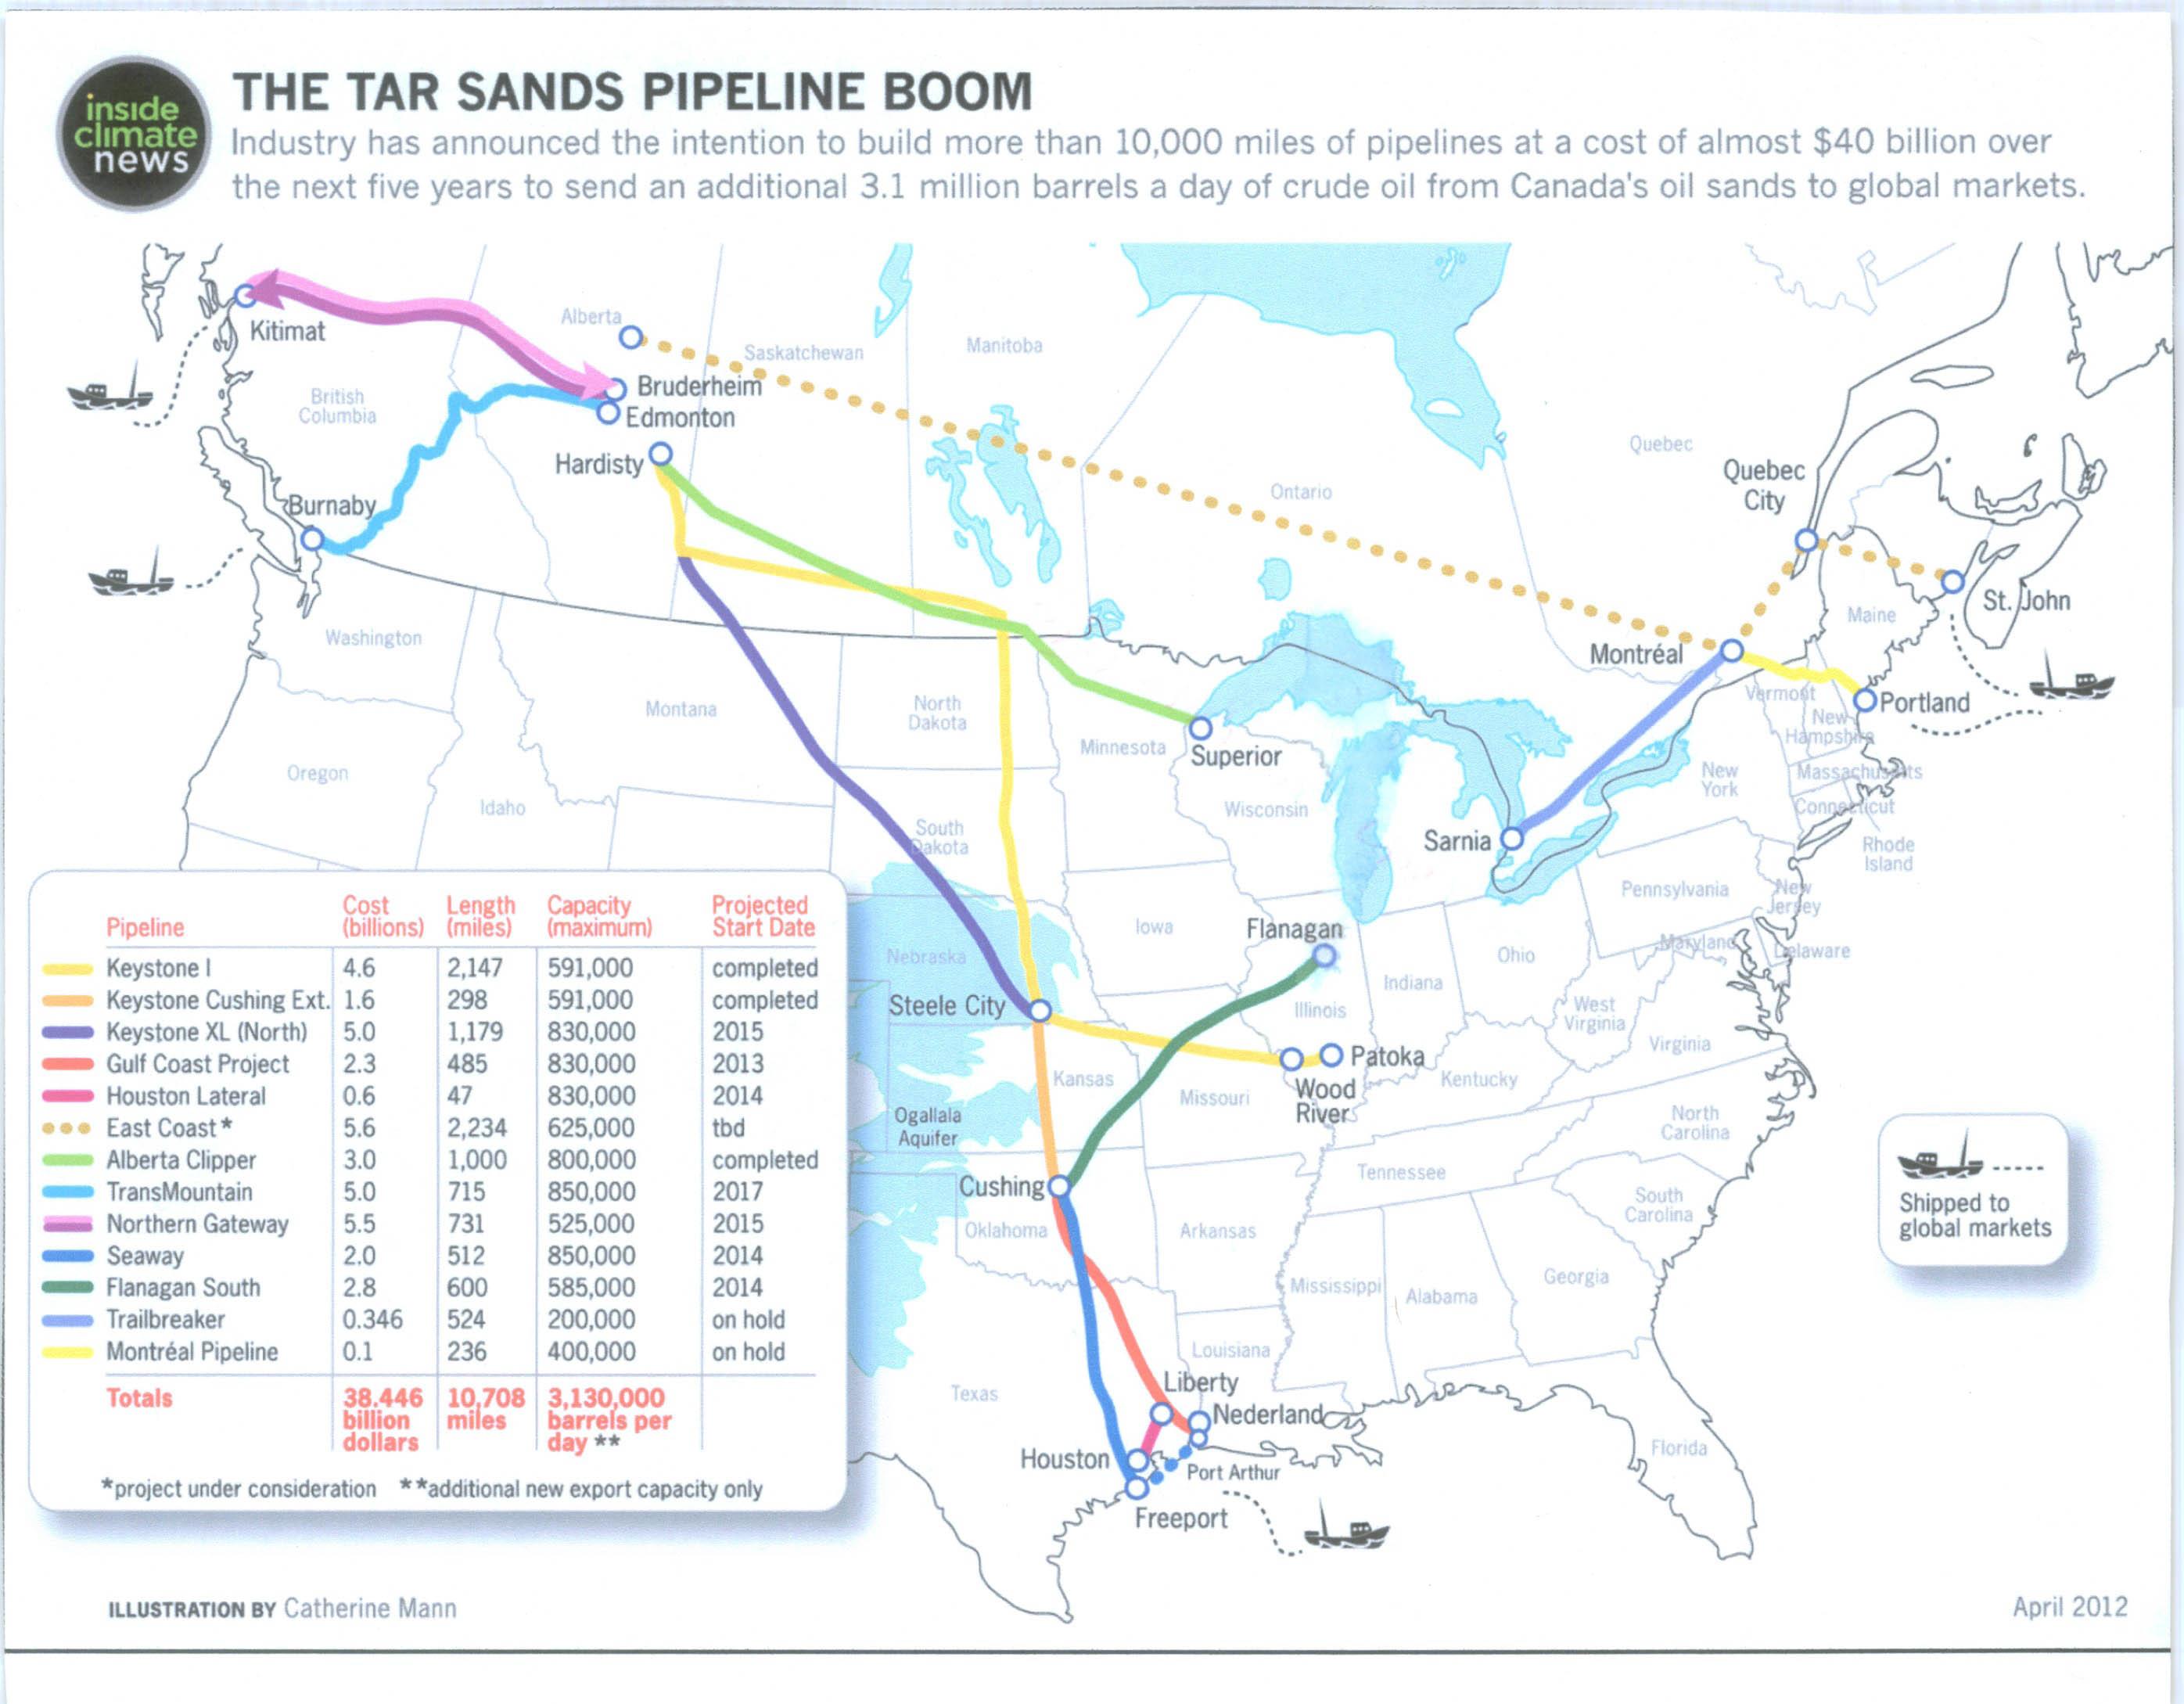 Pipeline Boom in Canada